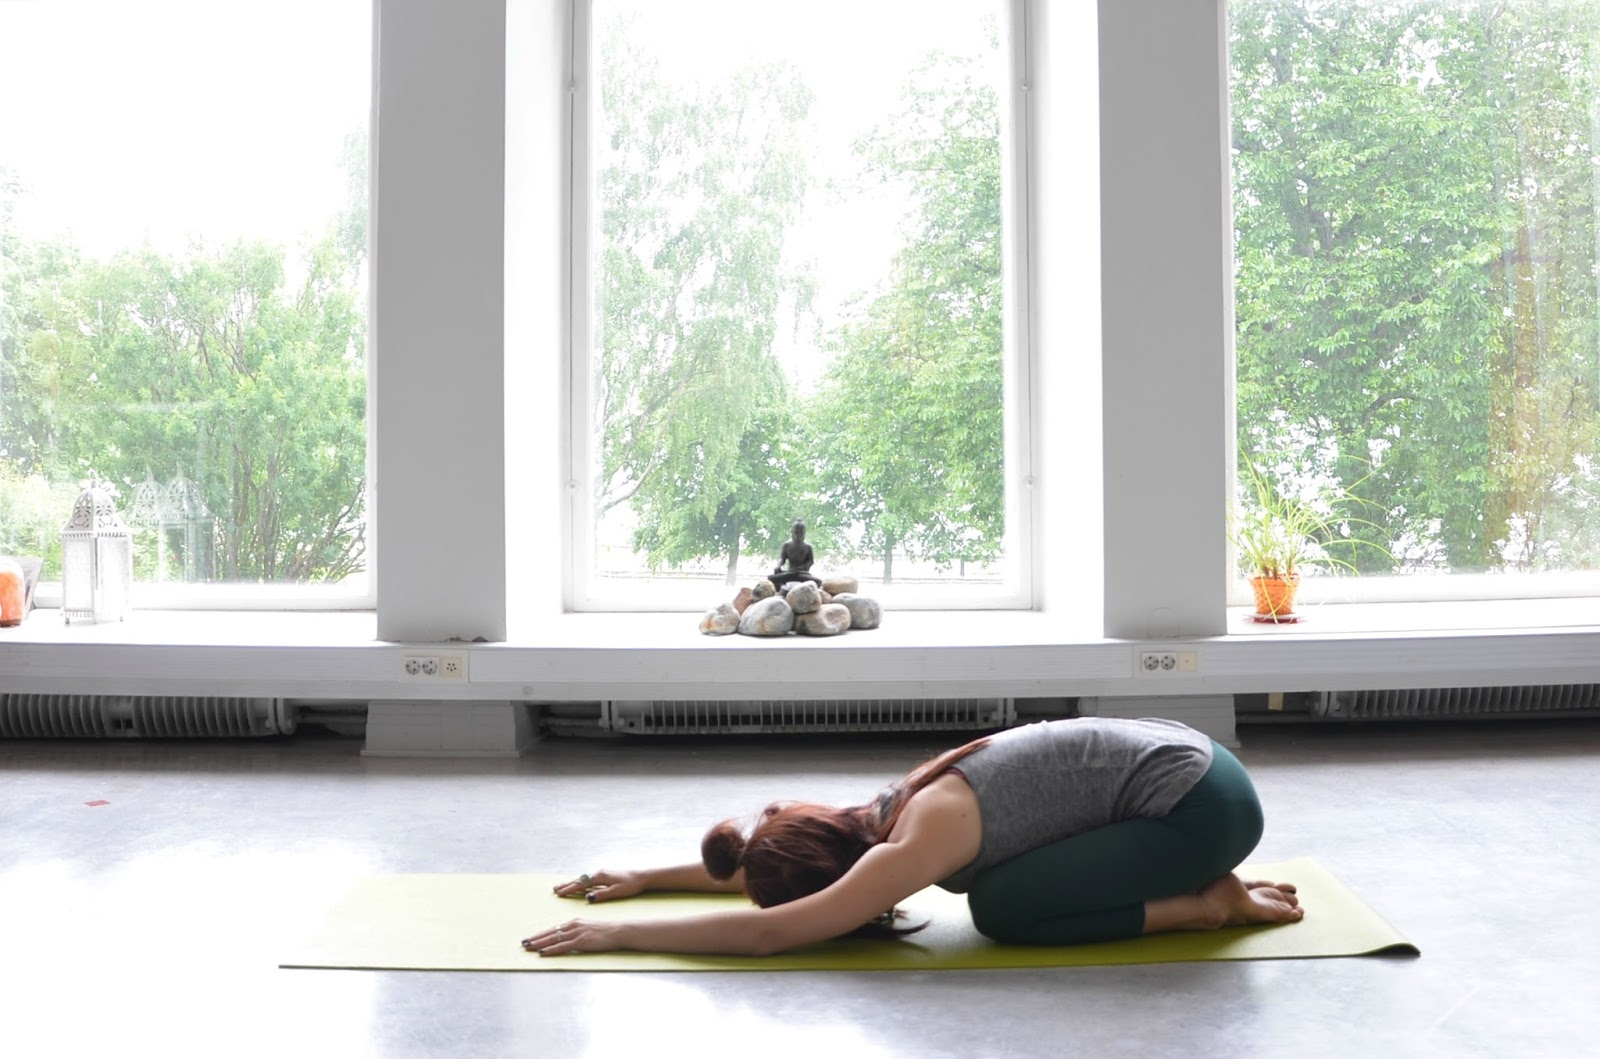 Amandas Yoga: Yin Yoga to Balance the Chakras